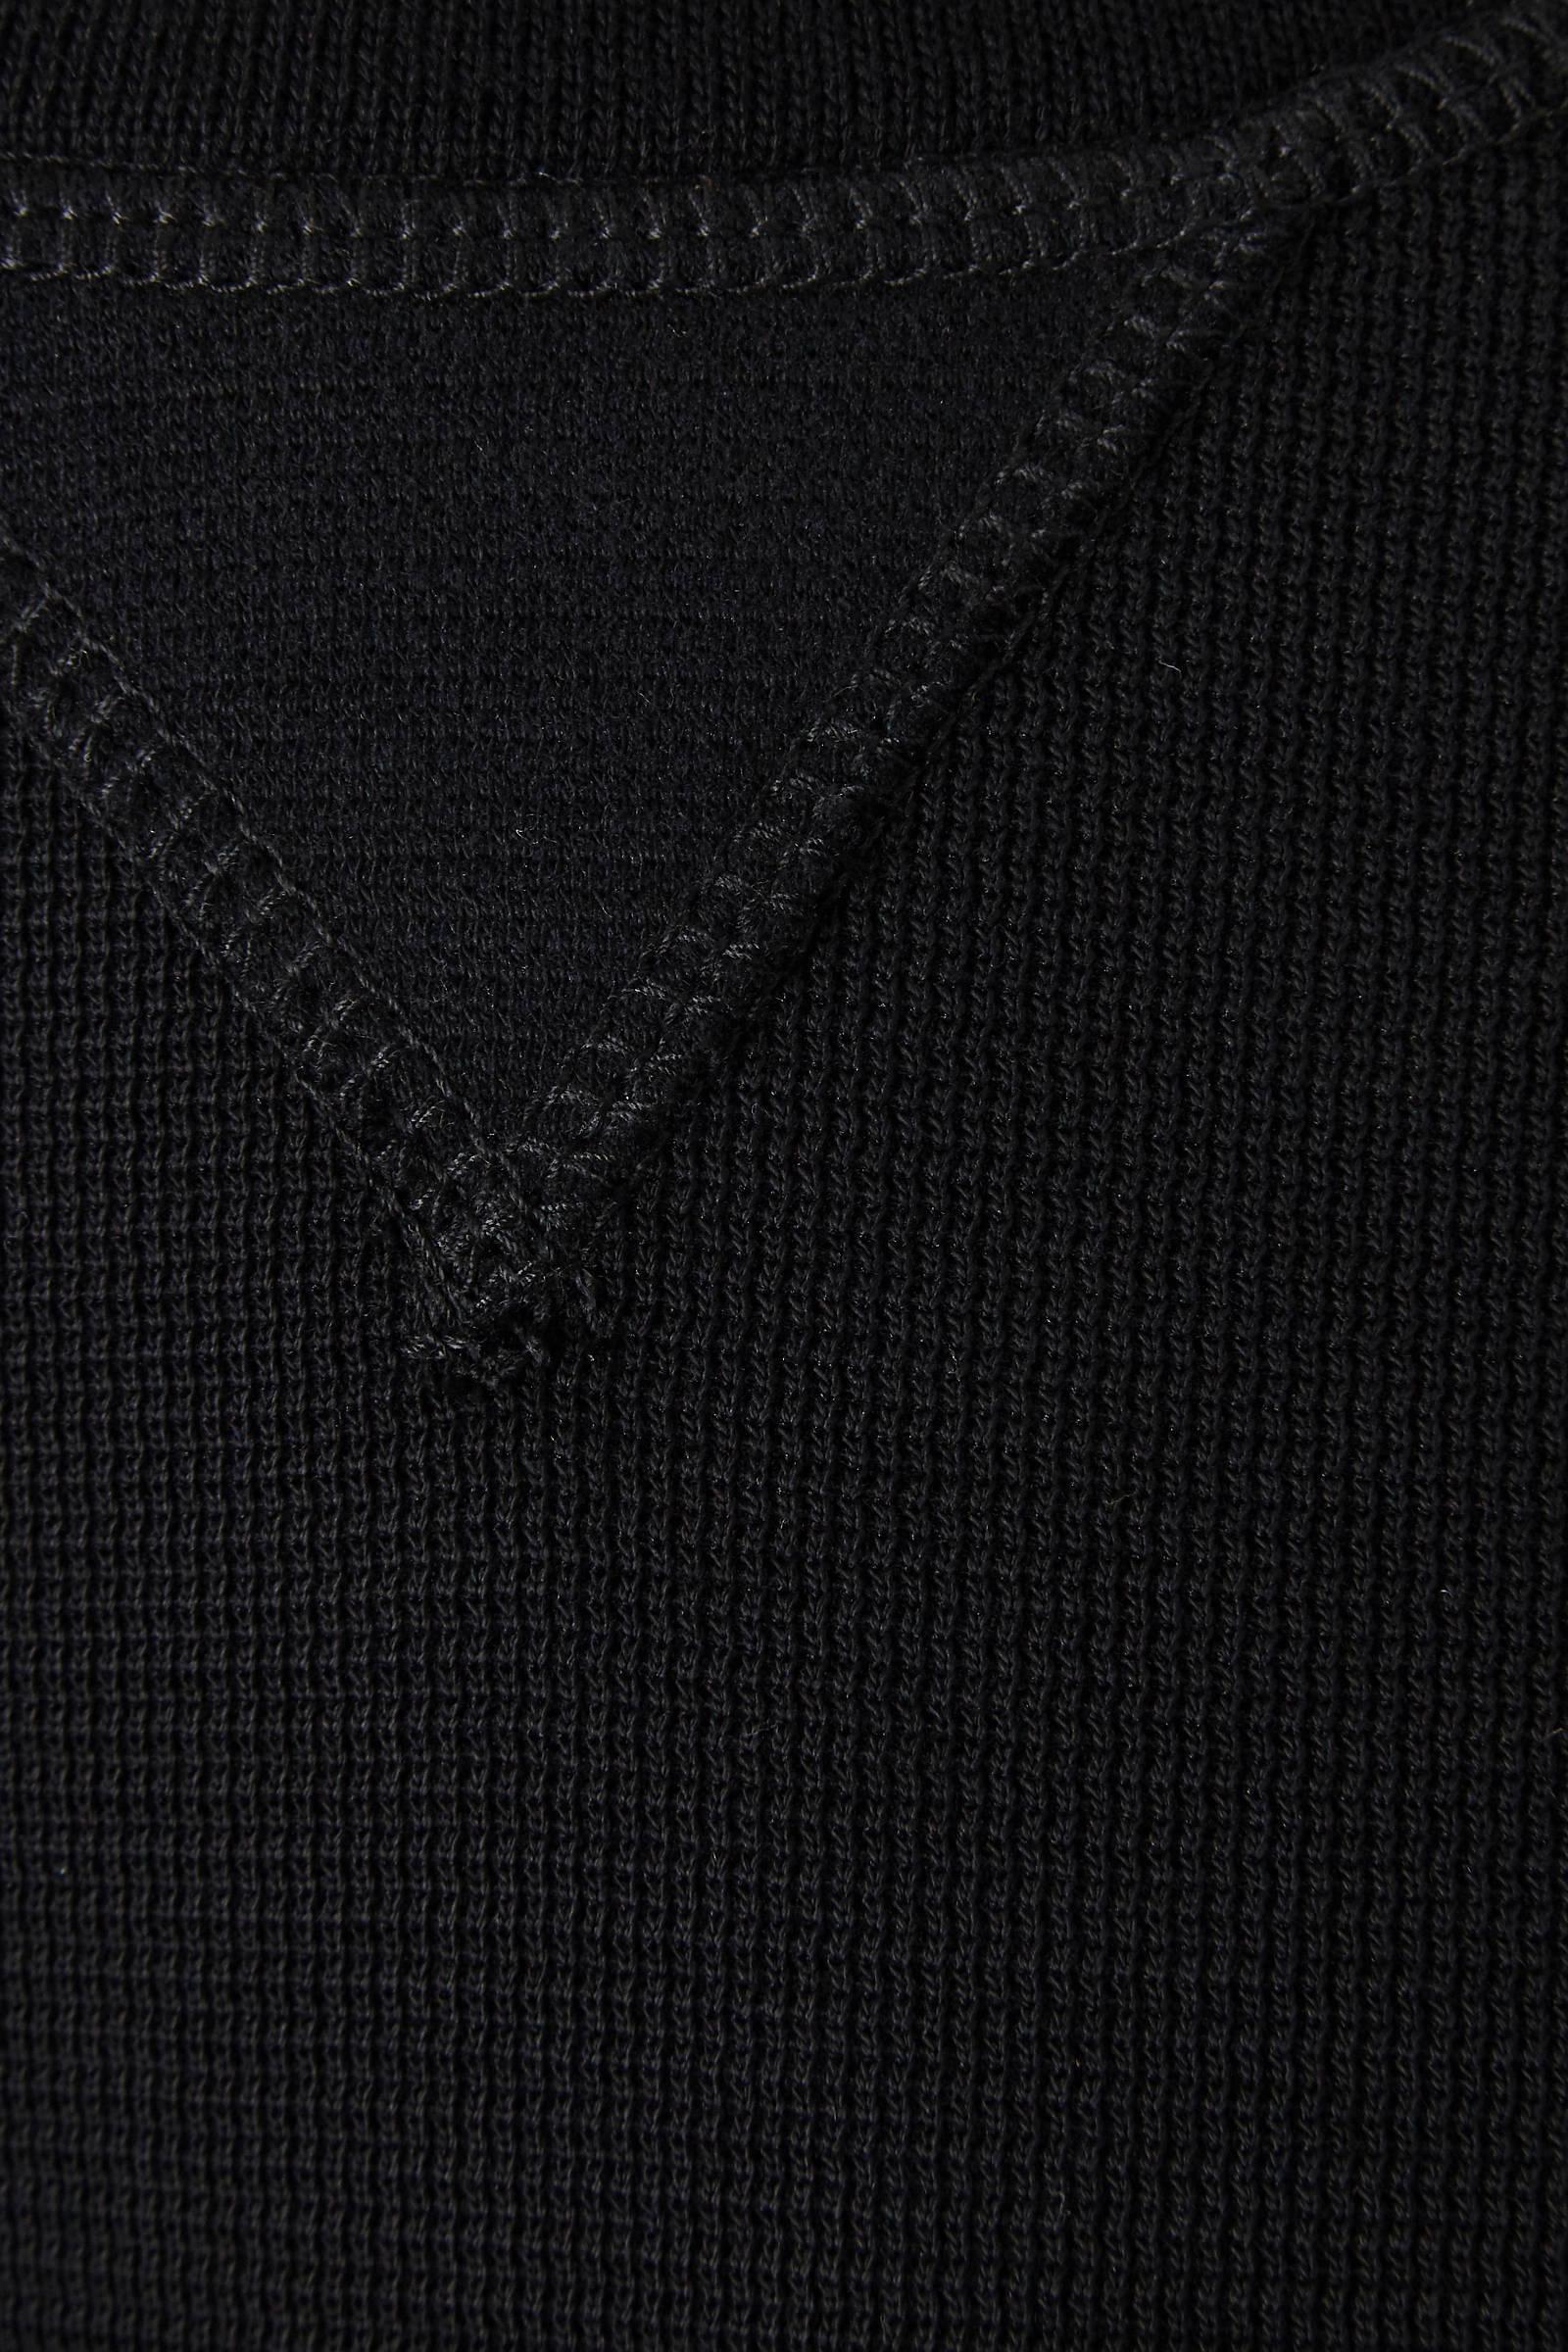 sweater sweater Diesel sweater Diesel sweater Diesel Diesel Diesel sweater Diesel sweater qvtP1wvr